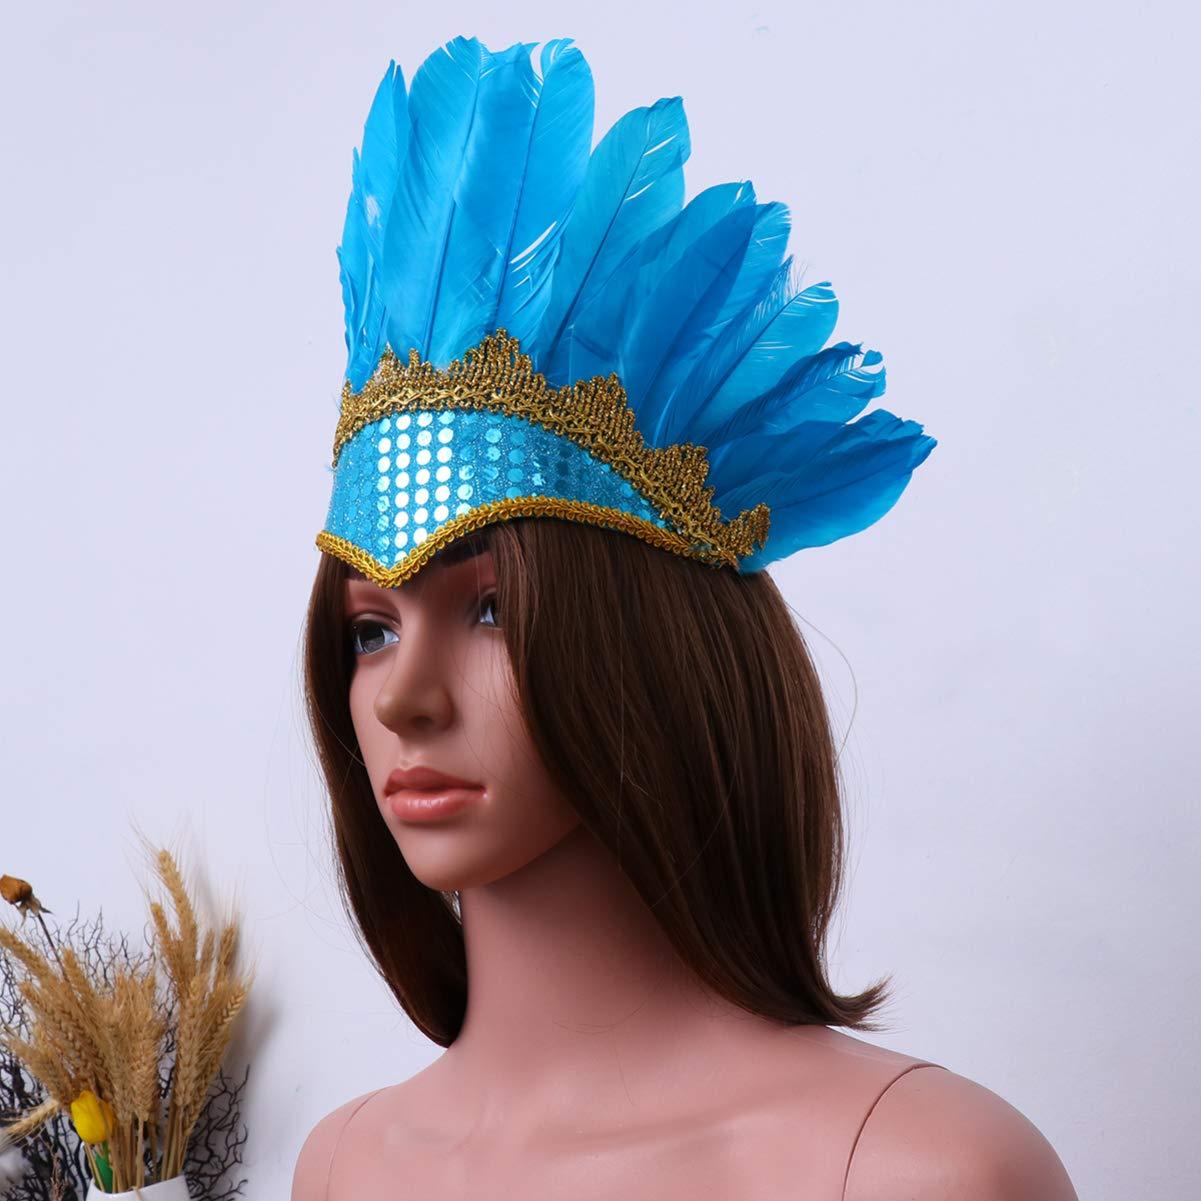 Amosfun nativi Indiani Bohemien Piuma Copricapo Puntelli di Carnevale Halloween nativi Americani Cosplay Fasce per Capelli Indiani